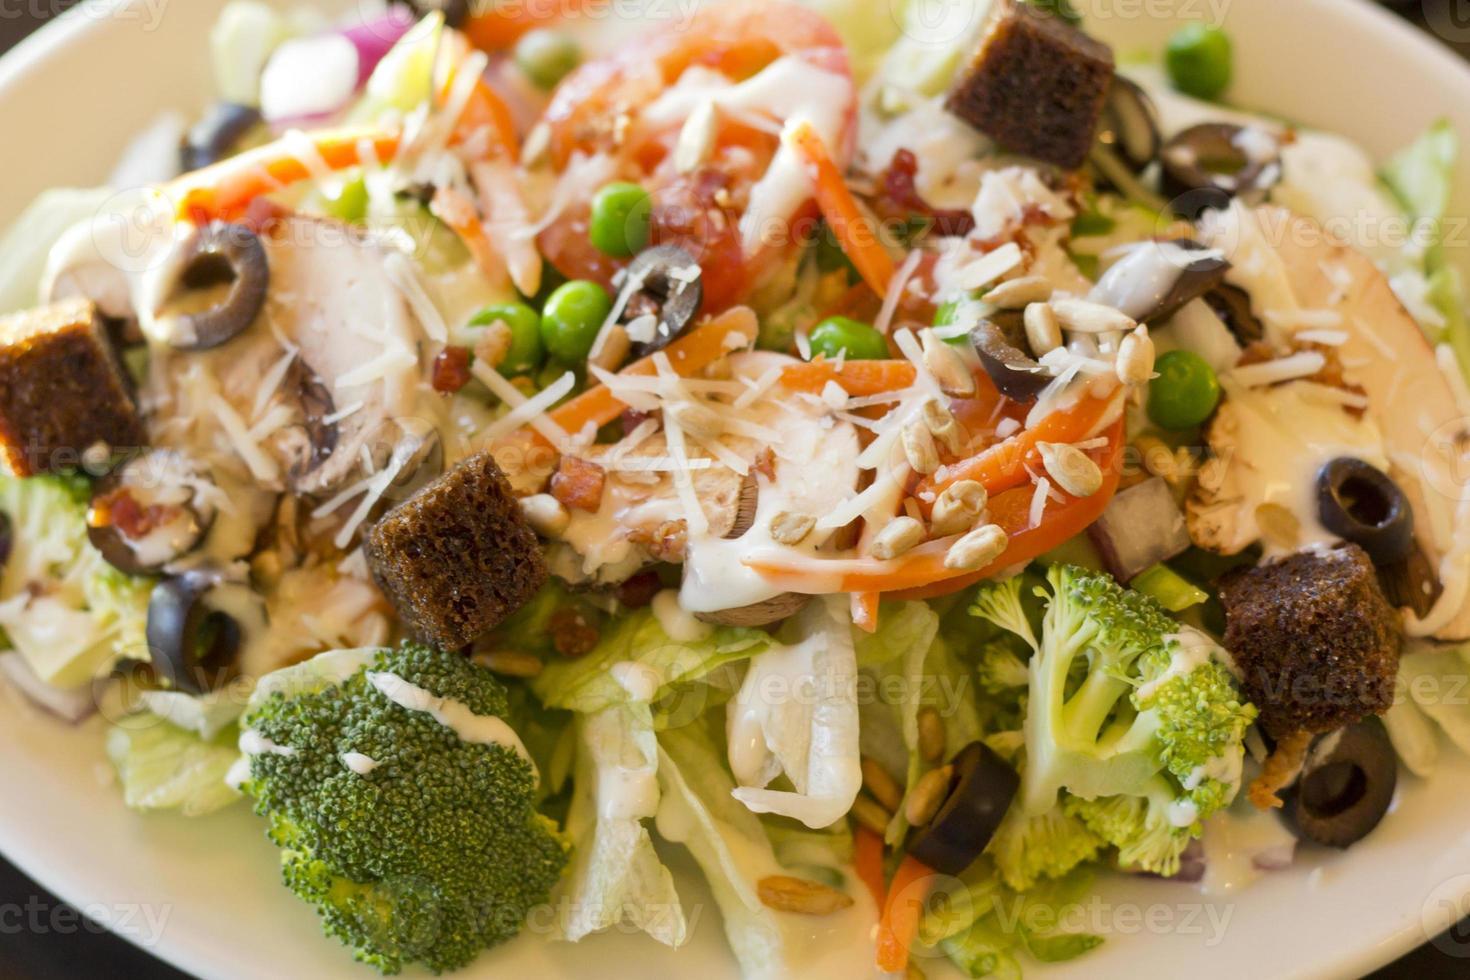 Everything Vegetable Salad photo